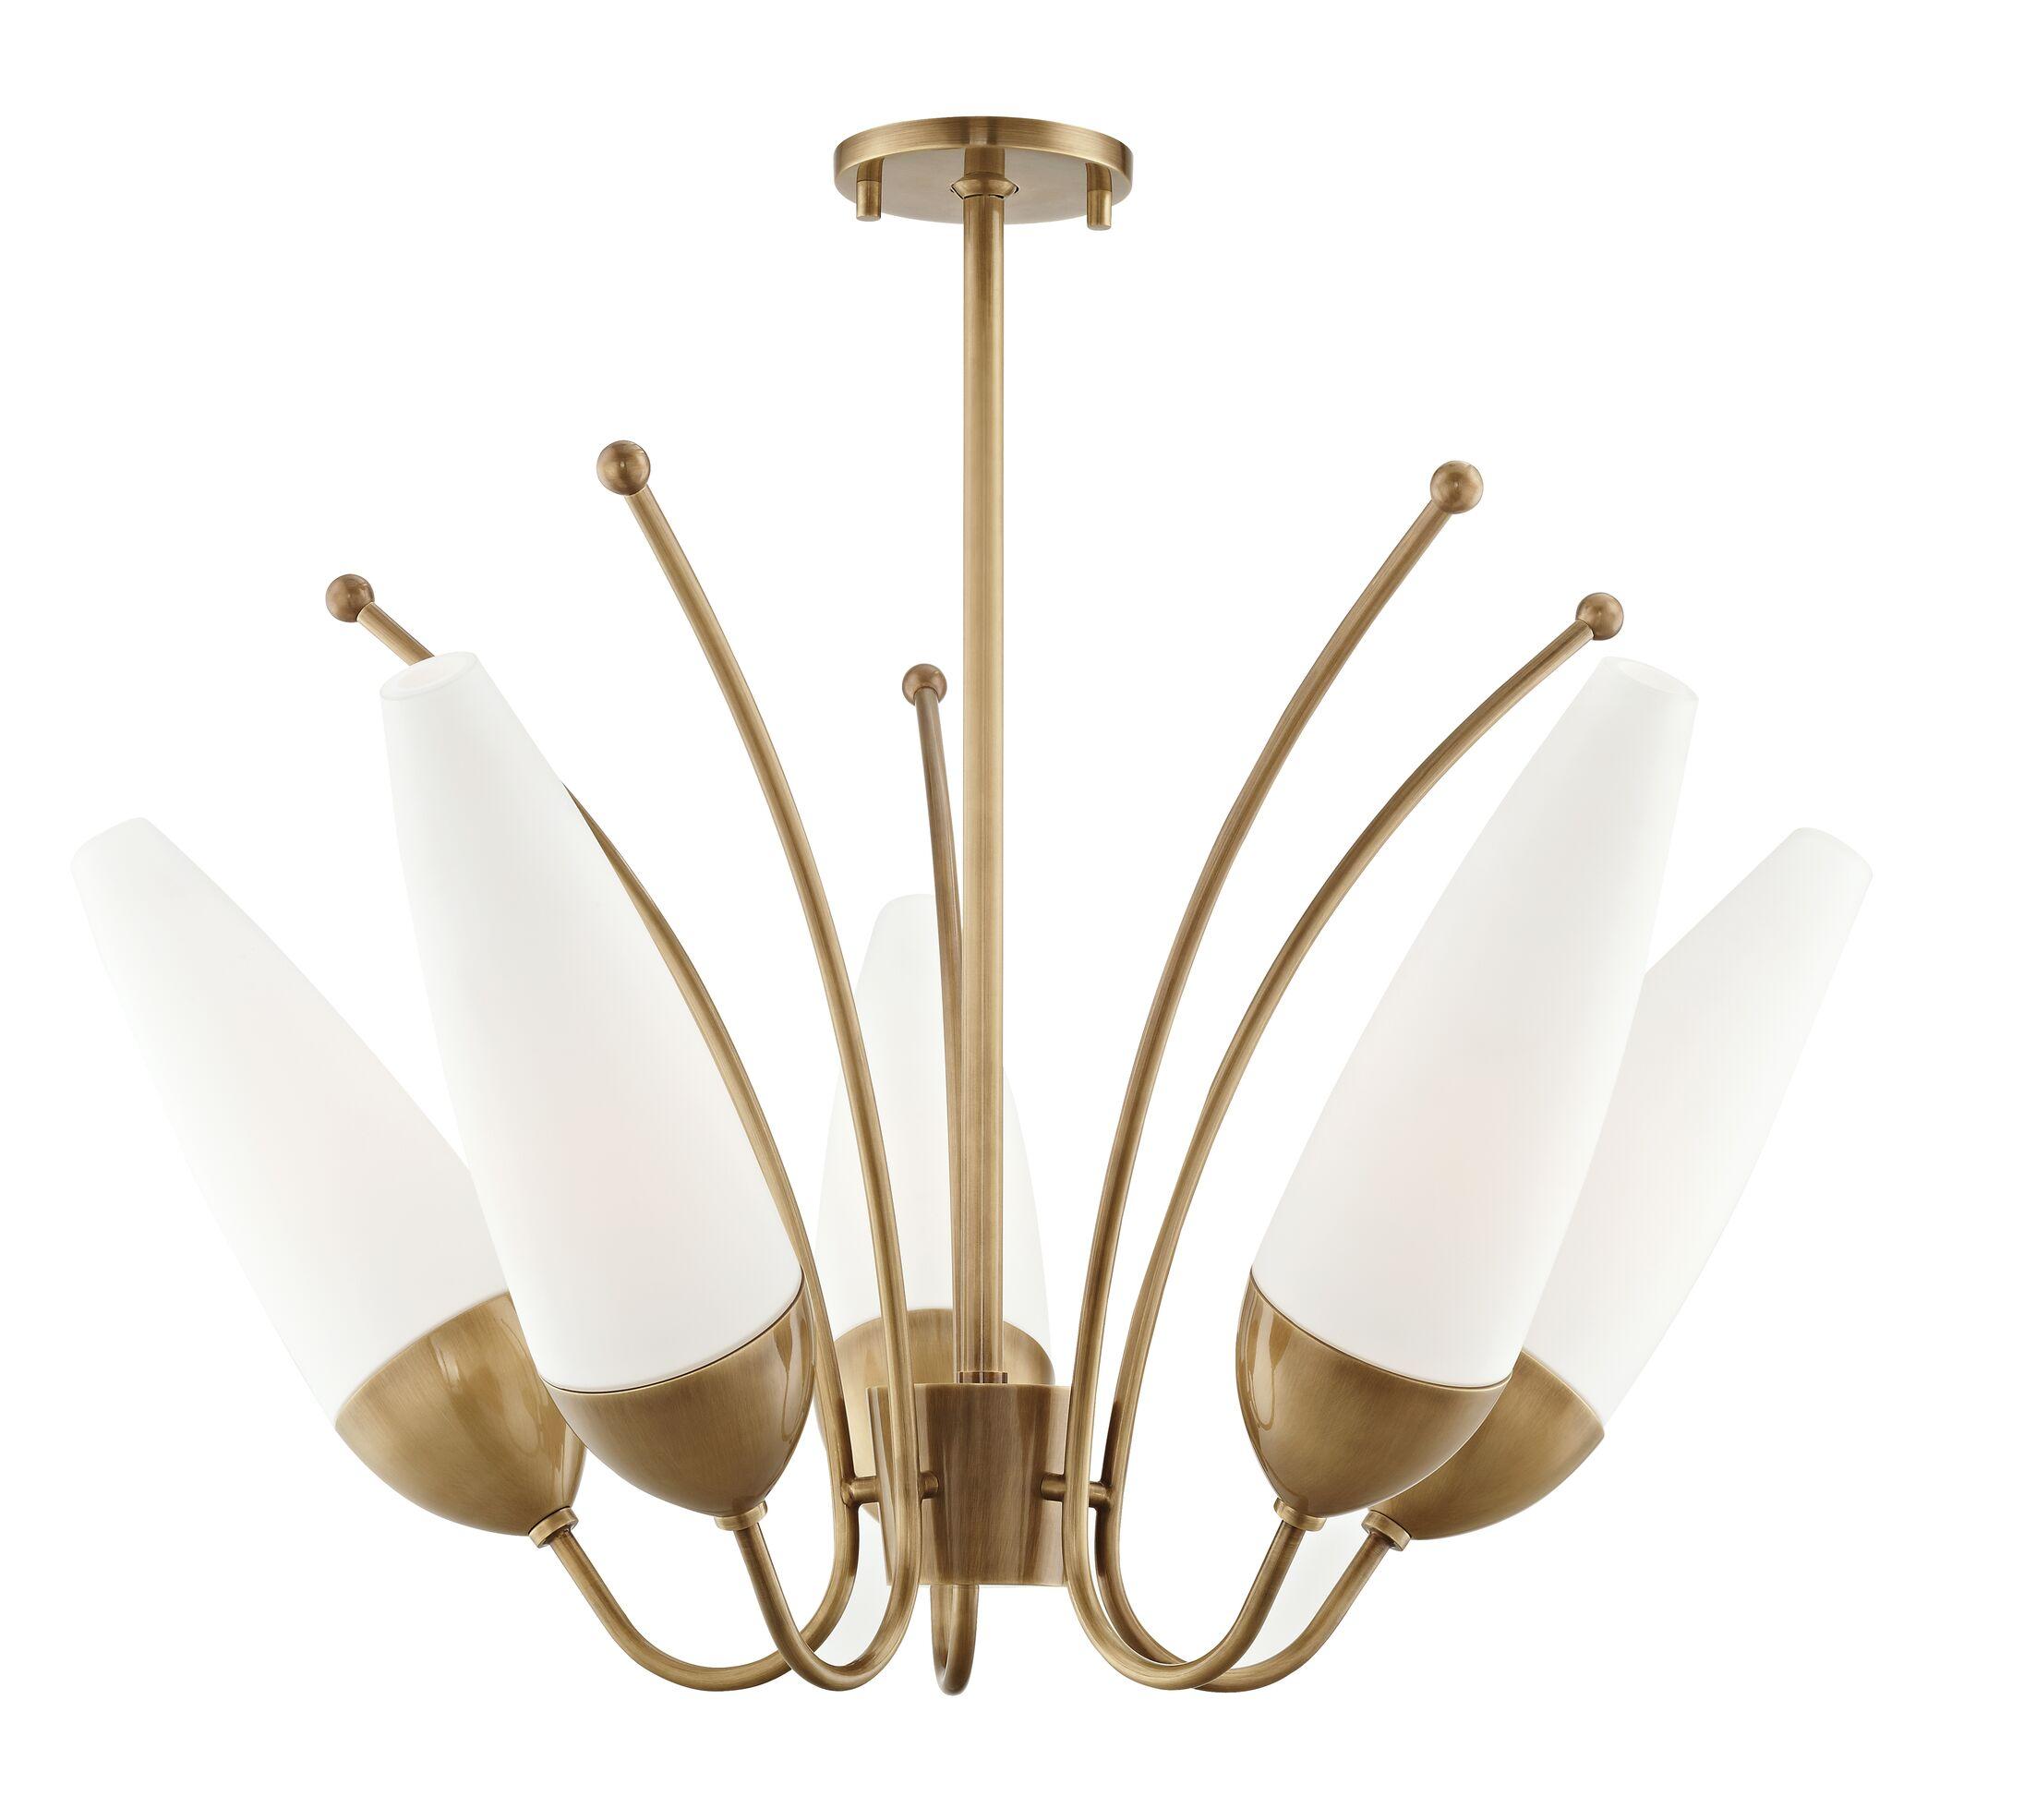 Despres 5-Light Shaded Chandelier Finish: Aged Brass